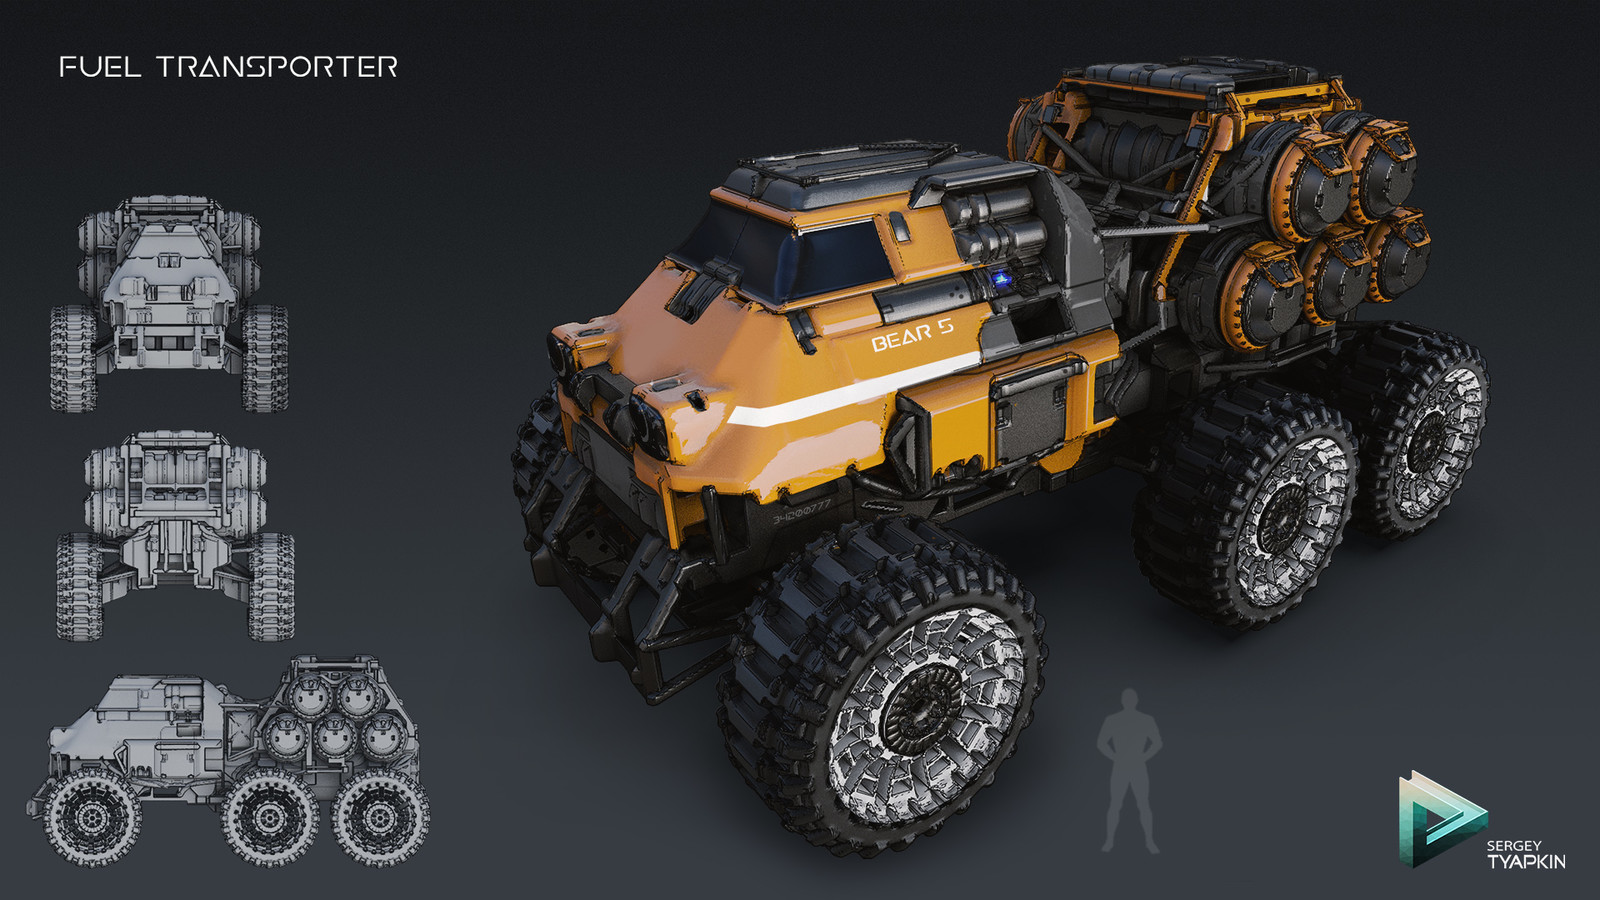 Fuel Transporter